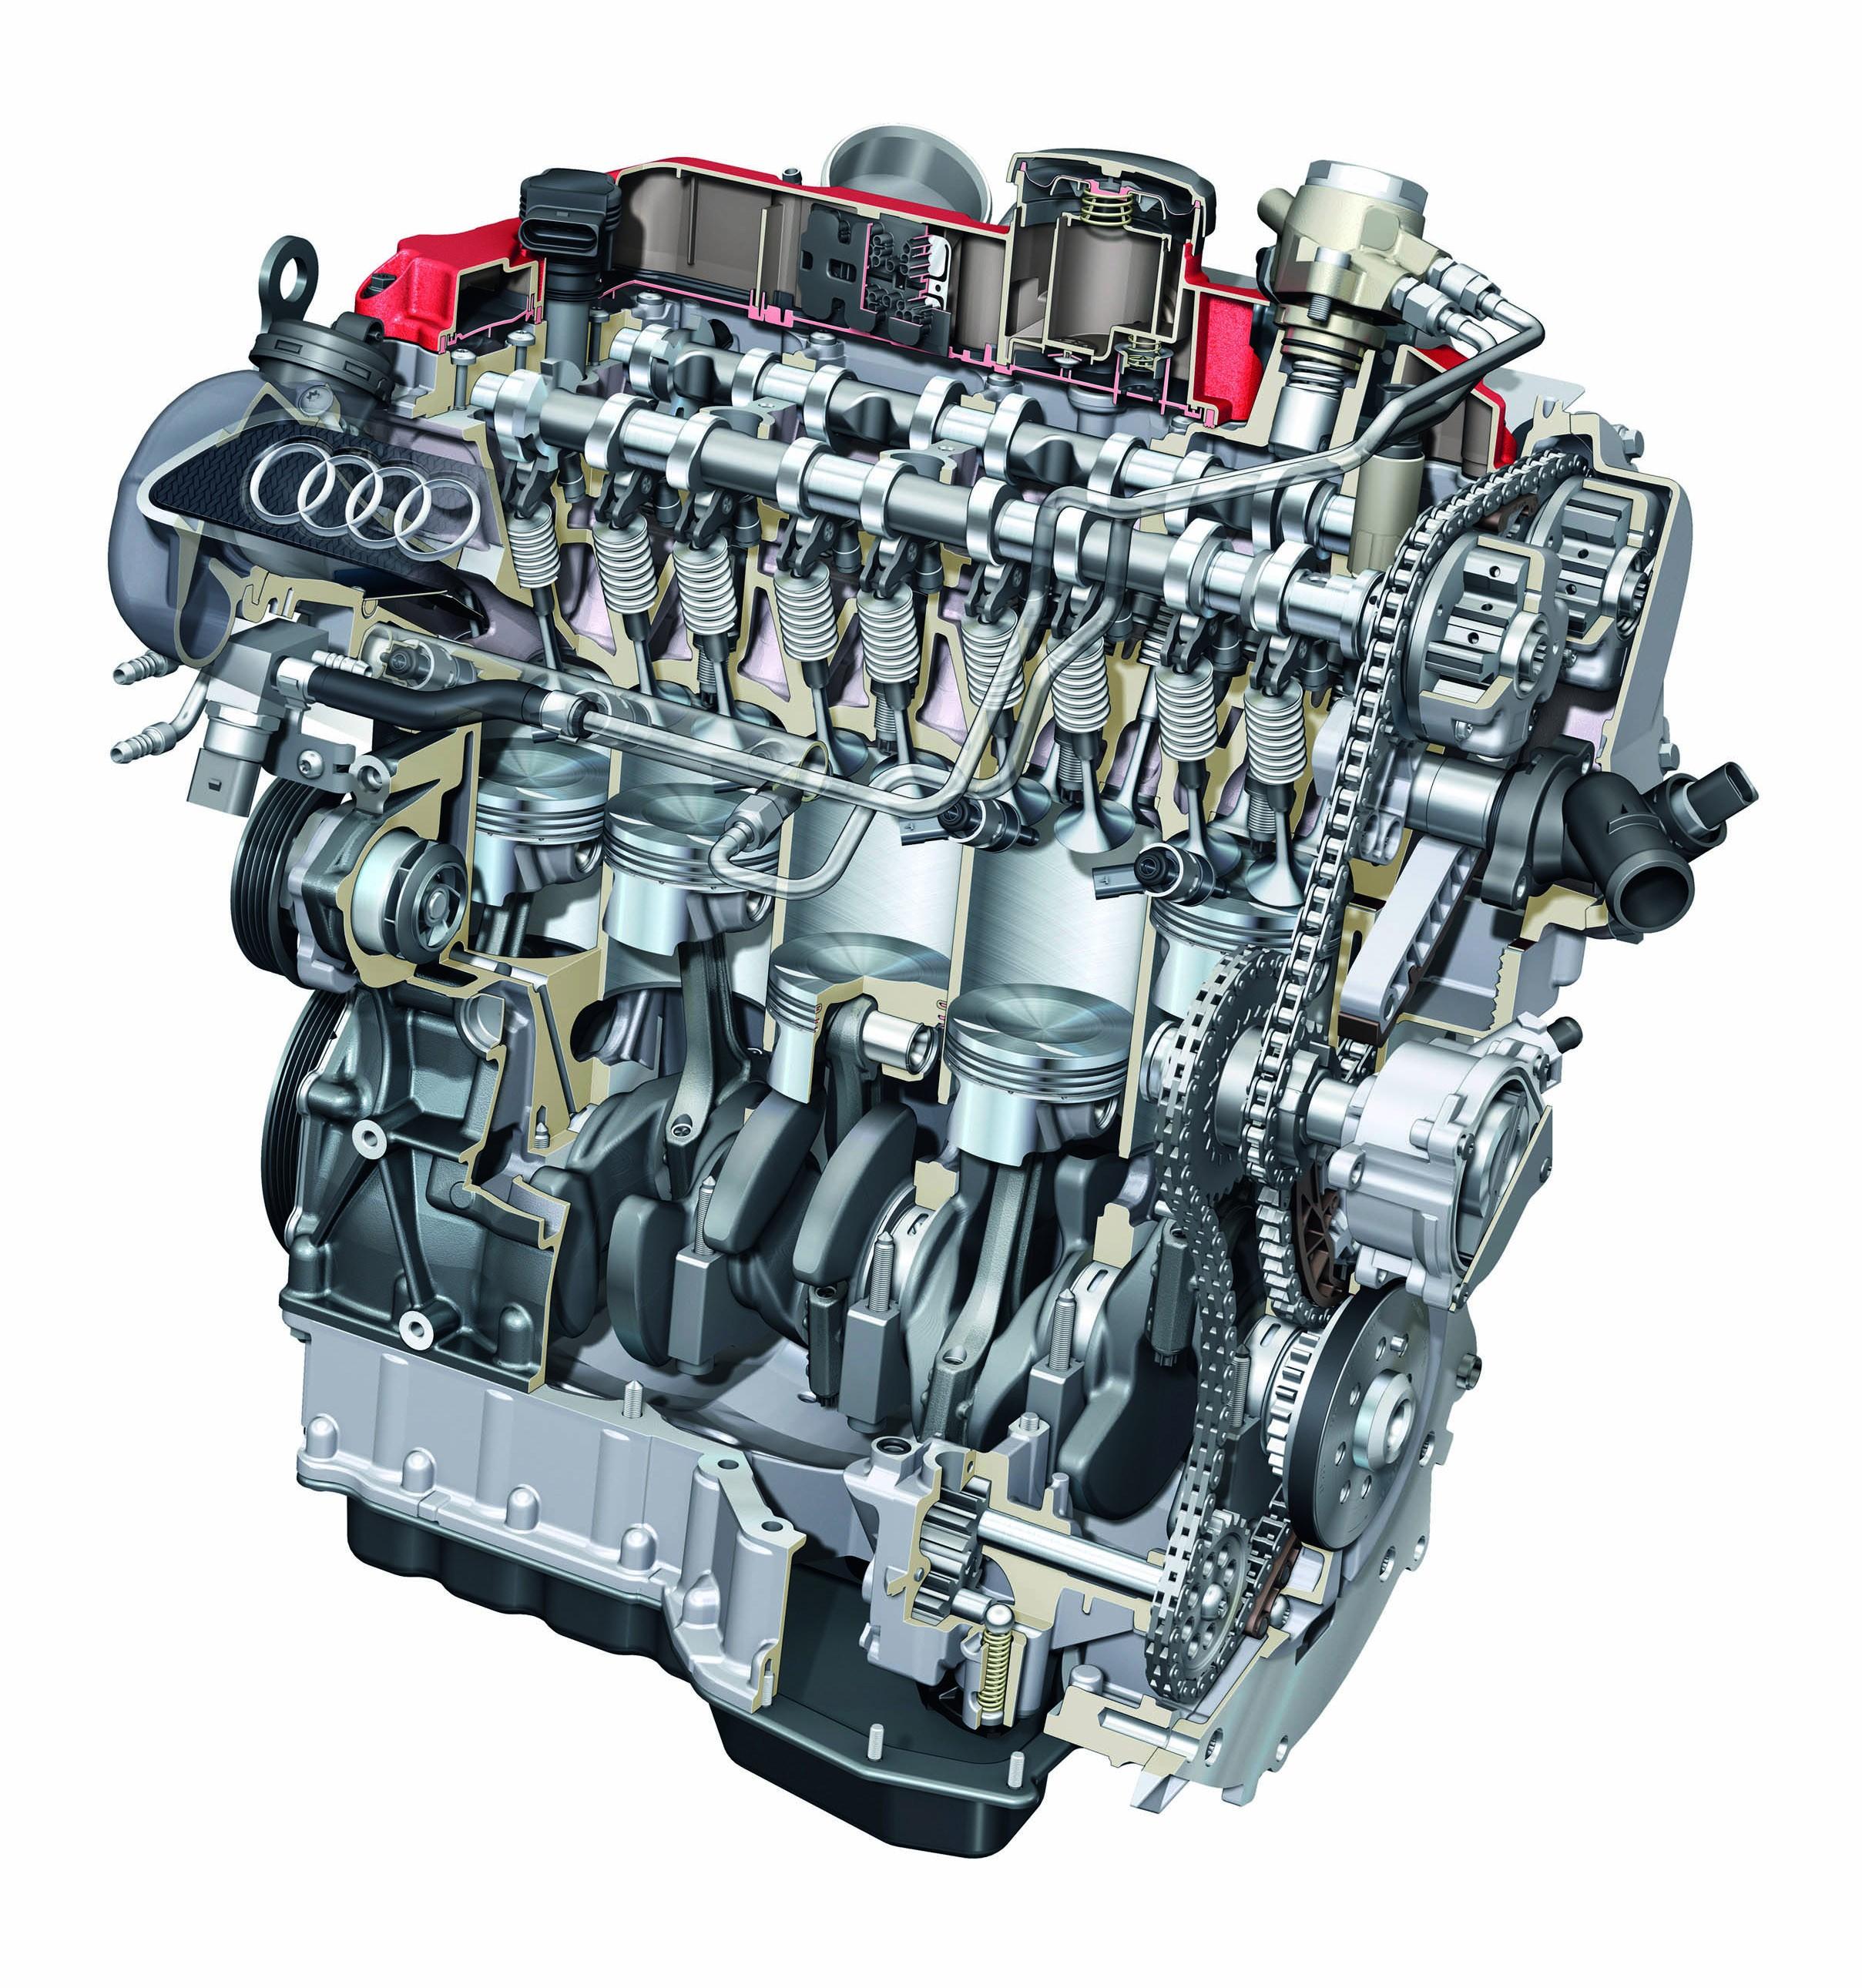 Vw 2 0 Fsi Engine Diagram Vw 2 0 Fsi Engine Diagram Engines Of Vw 2 0 Fsi Engine Diagram